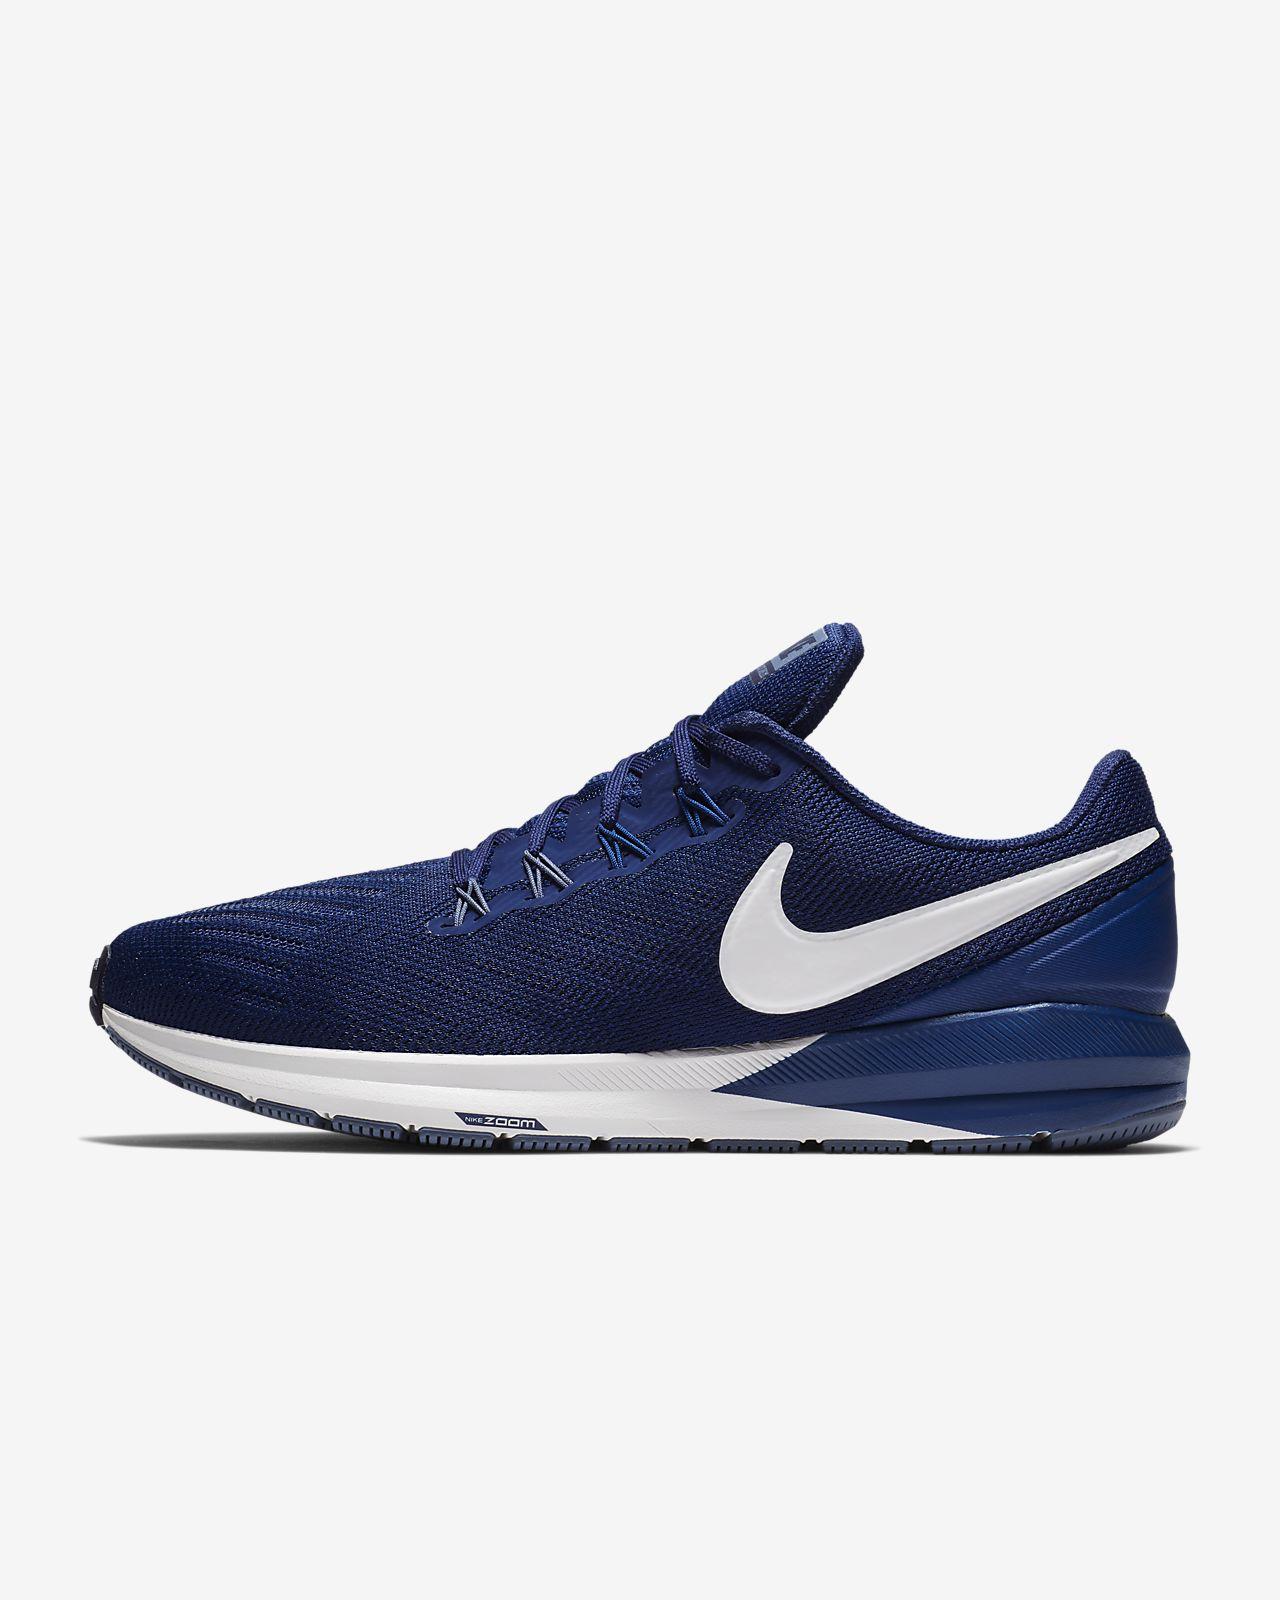 3b957f44ead0b Nike Air Zoom Structure 22 Men s Running Shoe. Nike.com CH